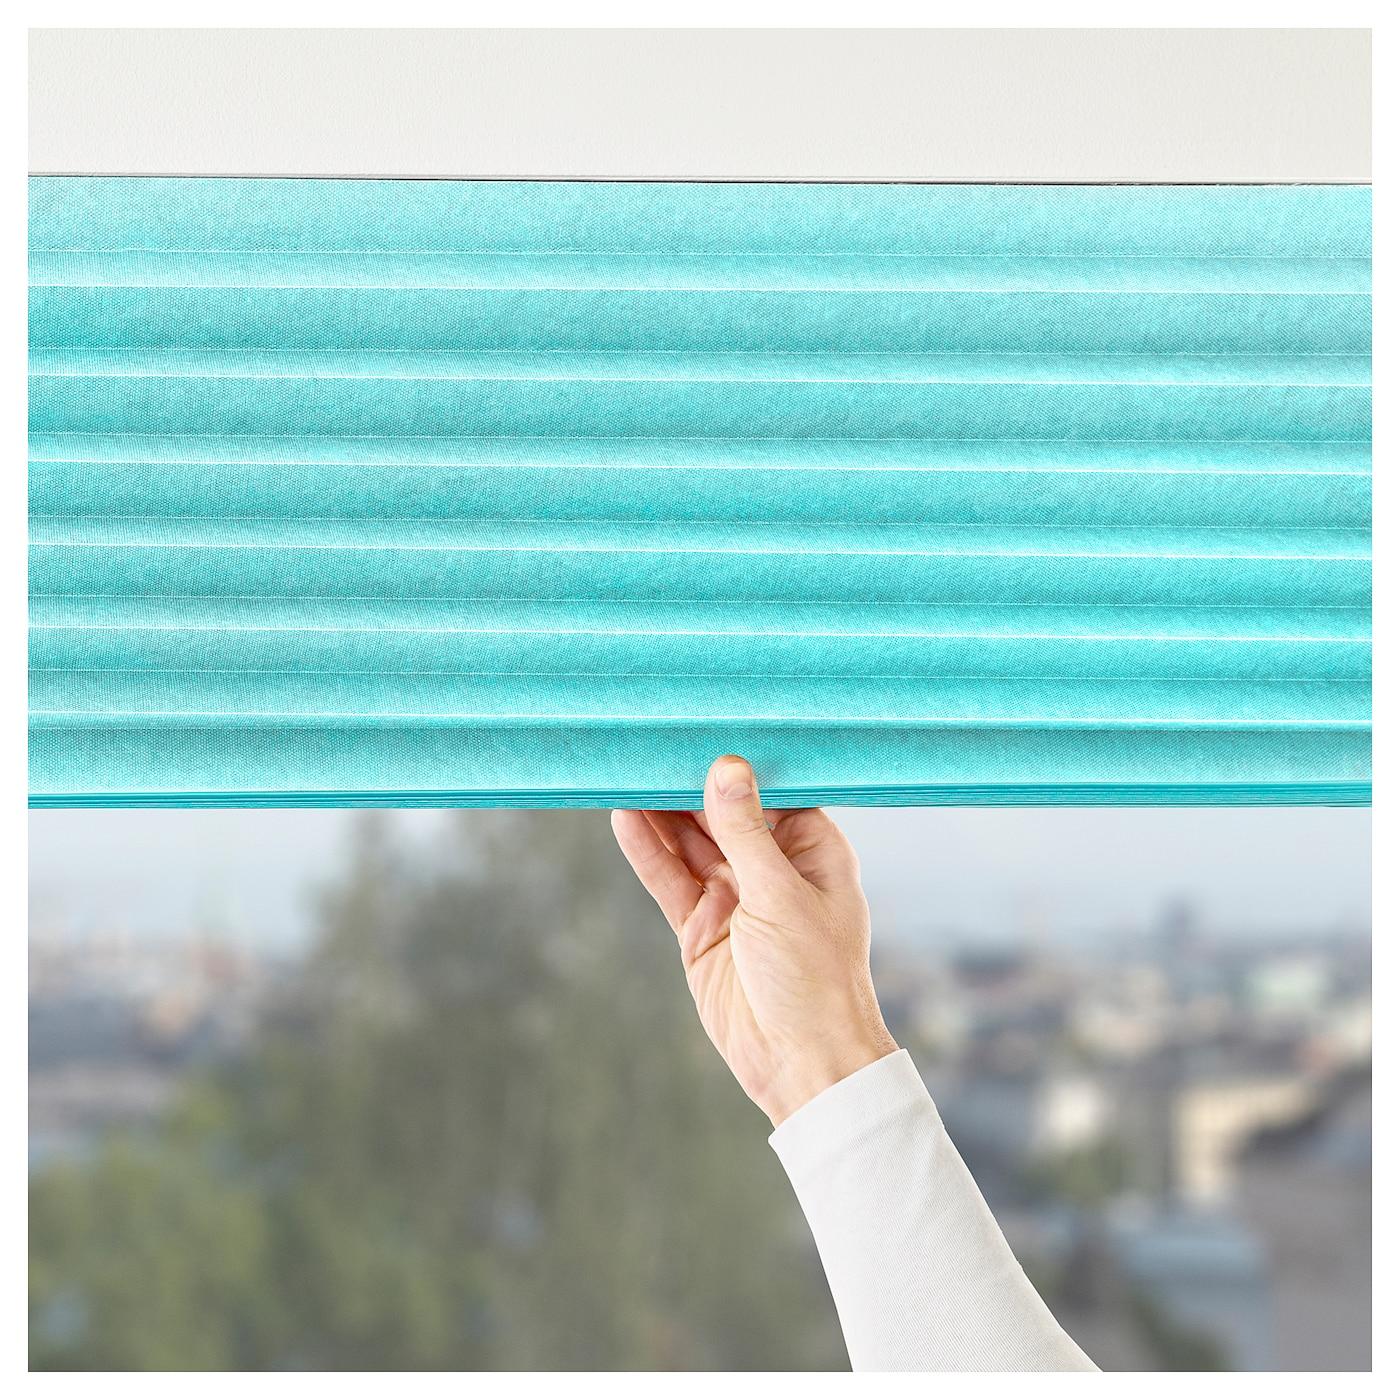 sommar 2018 pleated blind light turquoise 100x190 cm ikea. Black Bedroom Furniture Sets. Home Design Ideas